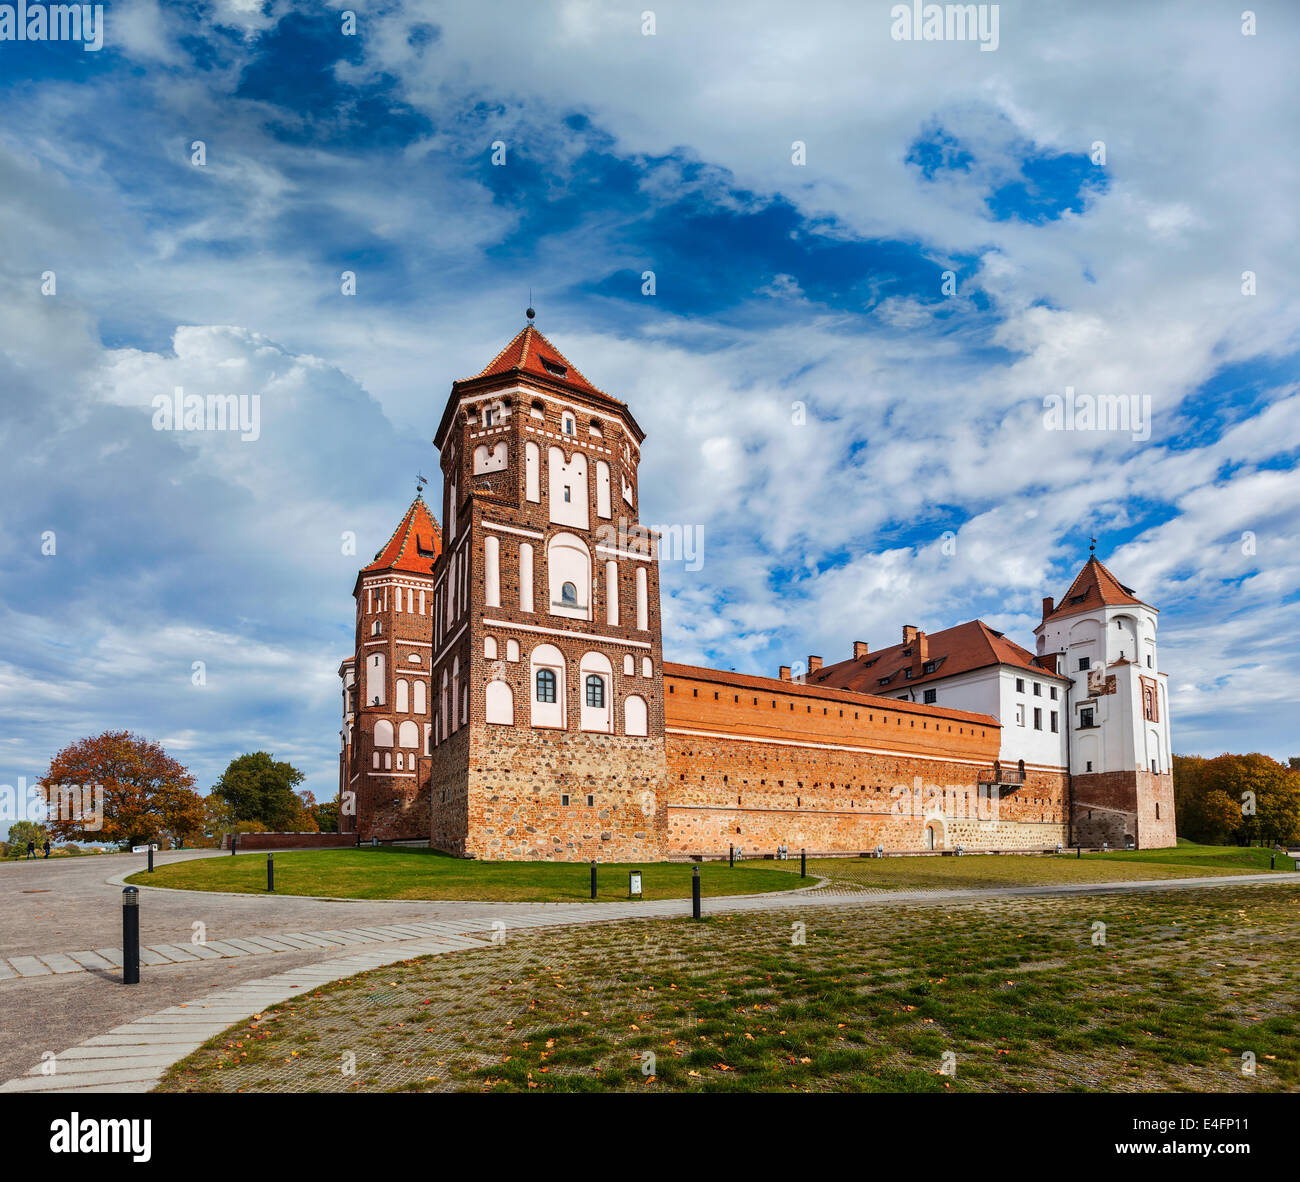 Travel belarus background - Medieval Mir castle famous landmark in town Mir, Belarus - Stock Image